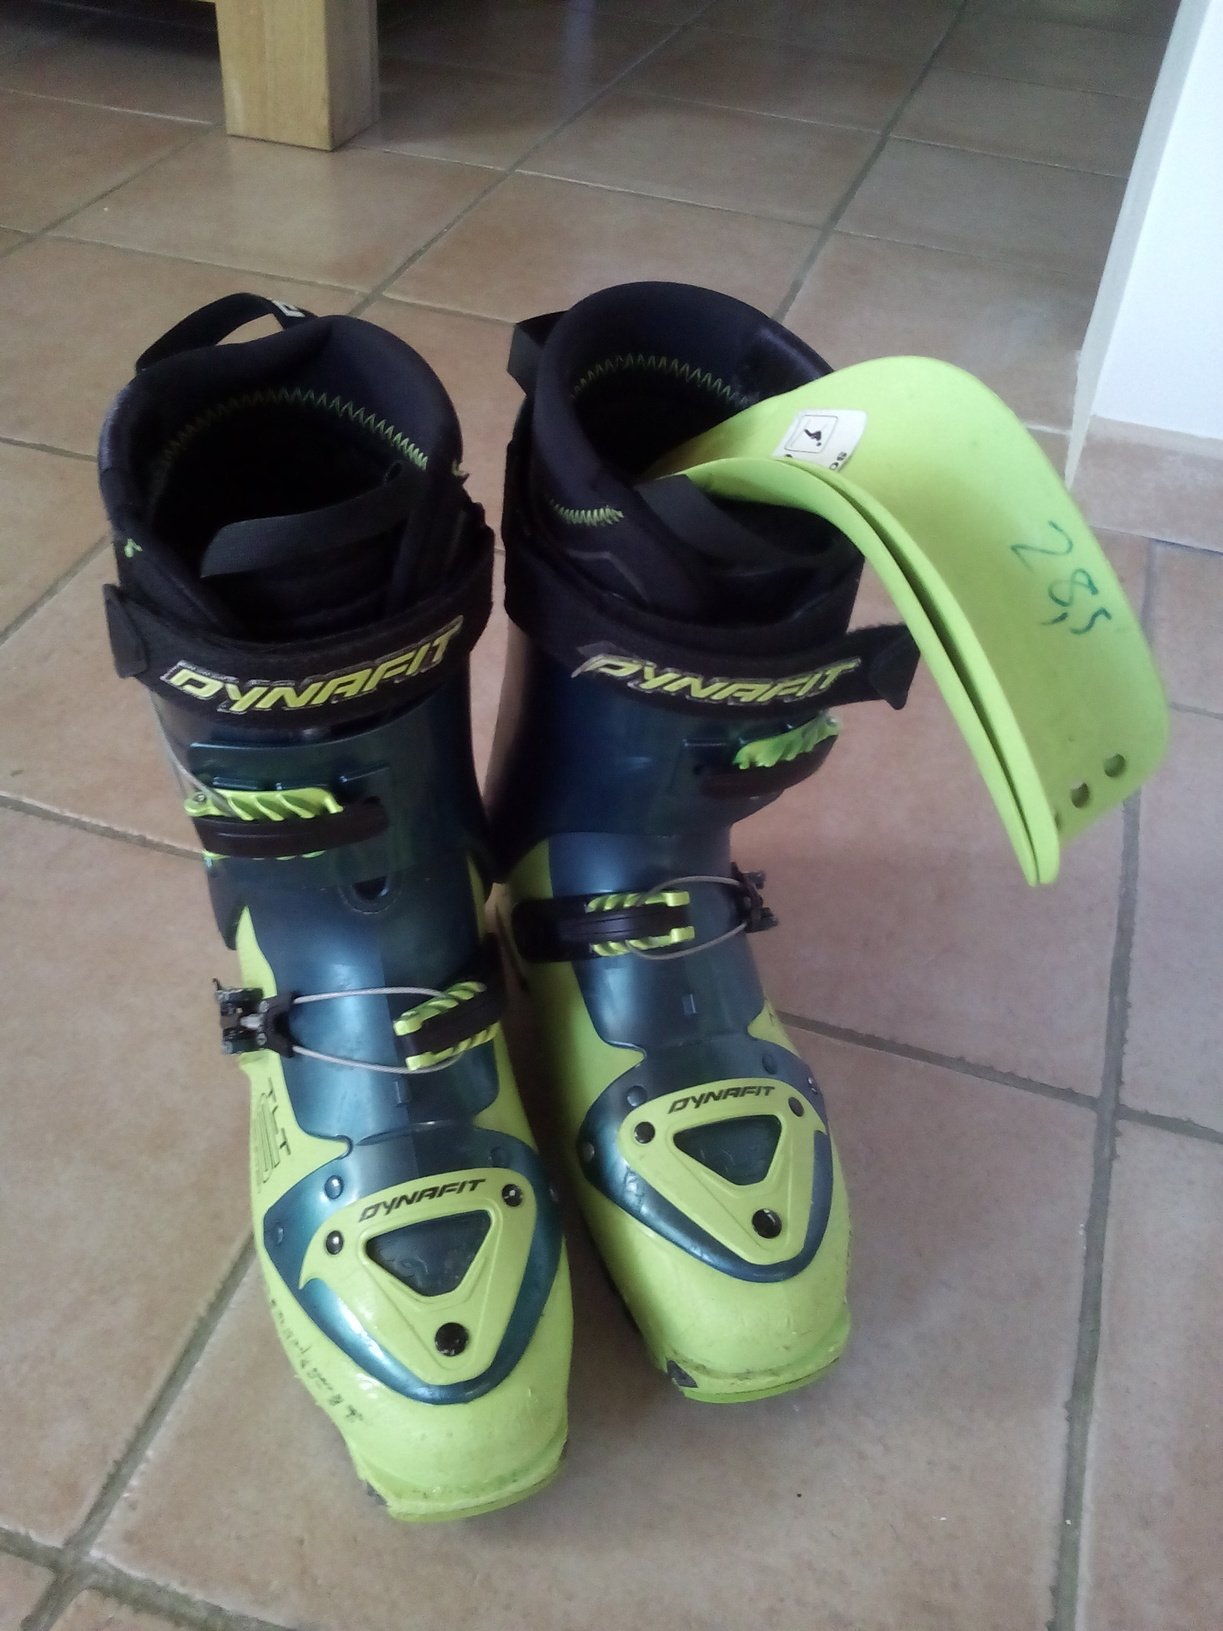 Forum Chaussures Dynafit 5 6 Cl Montain 5urh4r Rando Ski 4428 Tlt URdawqq